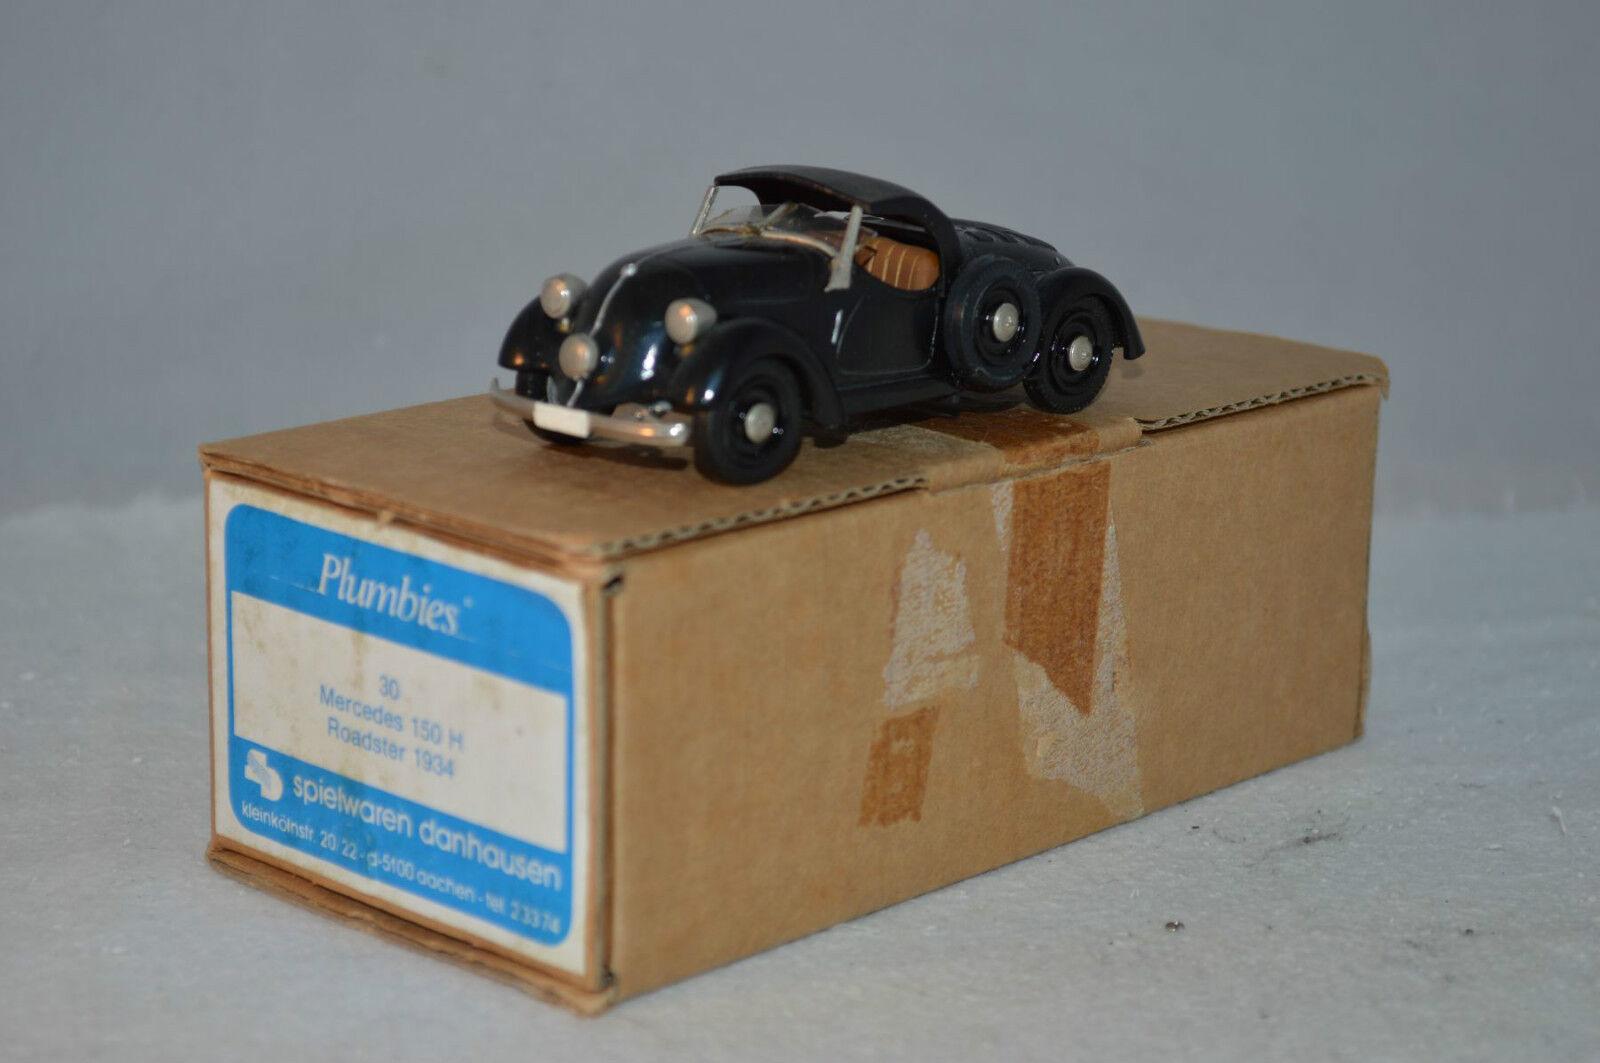 disfrutando de sus compras Western Models Plumbies, Mercedes-Benz 150 H Roadster 1934 1934 1934 1 43 mint in box  envío gratis